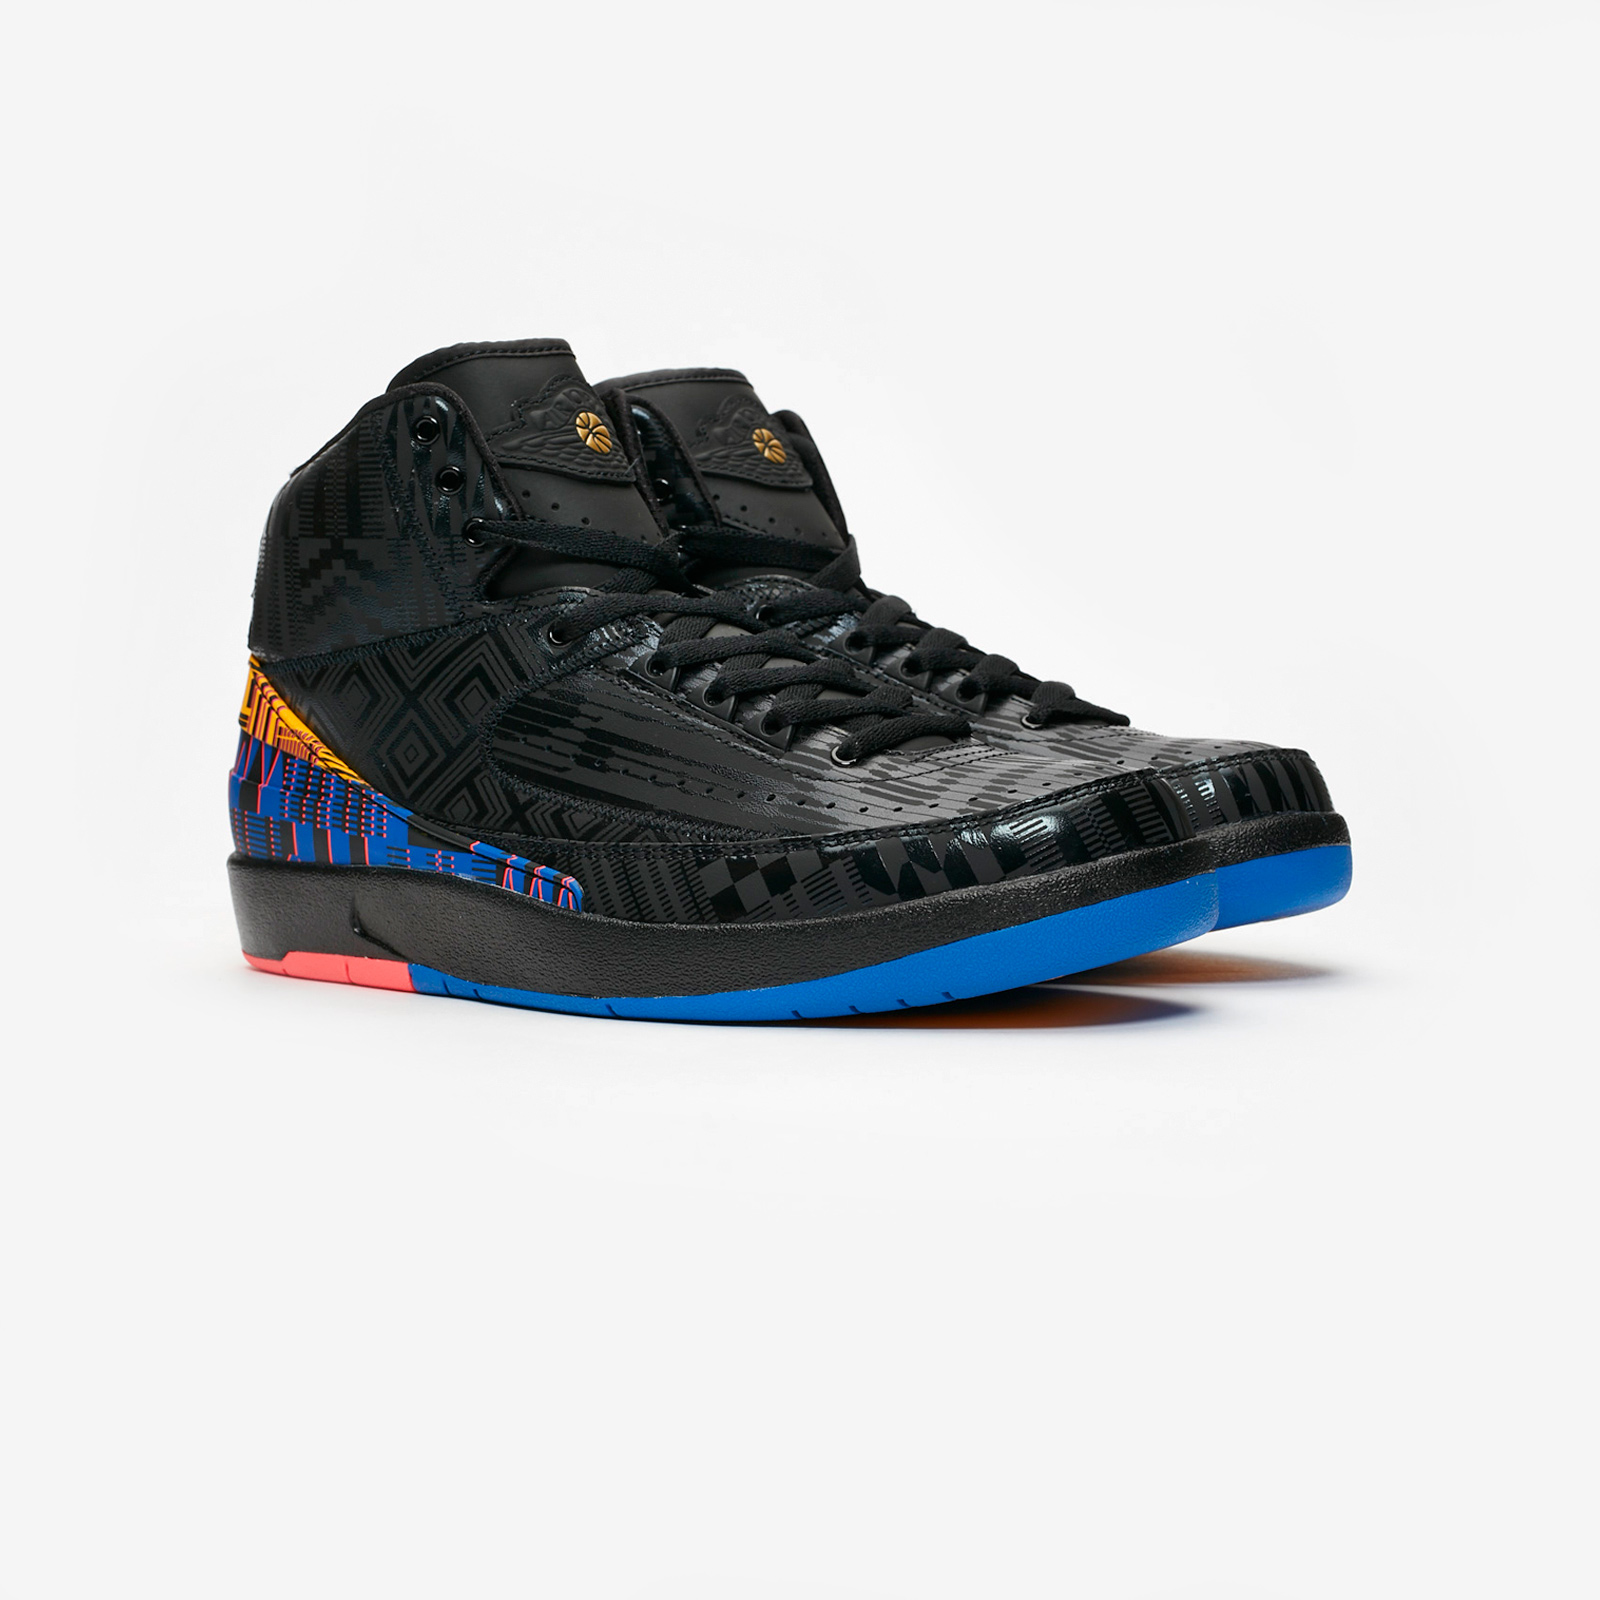 2ce5ae286b9b0b Jordan Brand Air Jordan 2 Retro BHM - Bq7618-007 - Sneakersnstuff ...